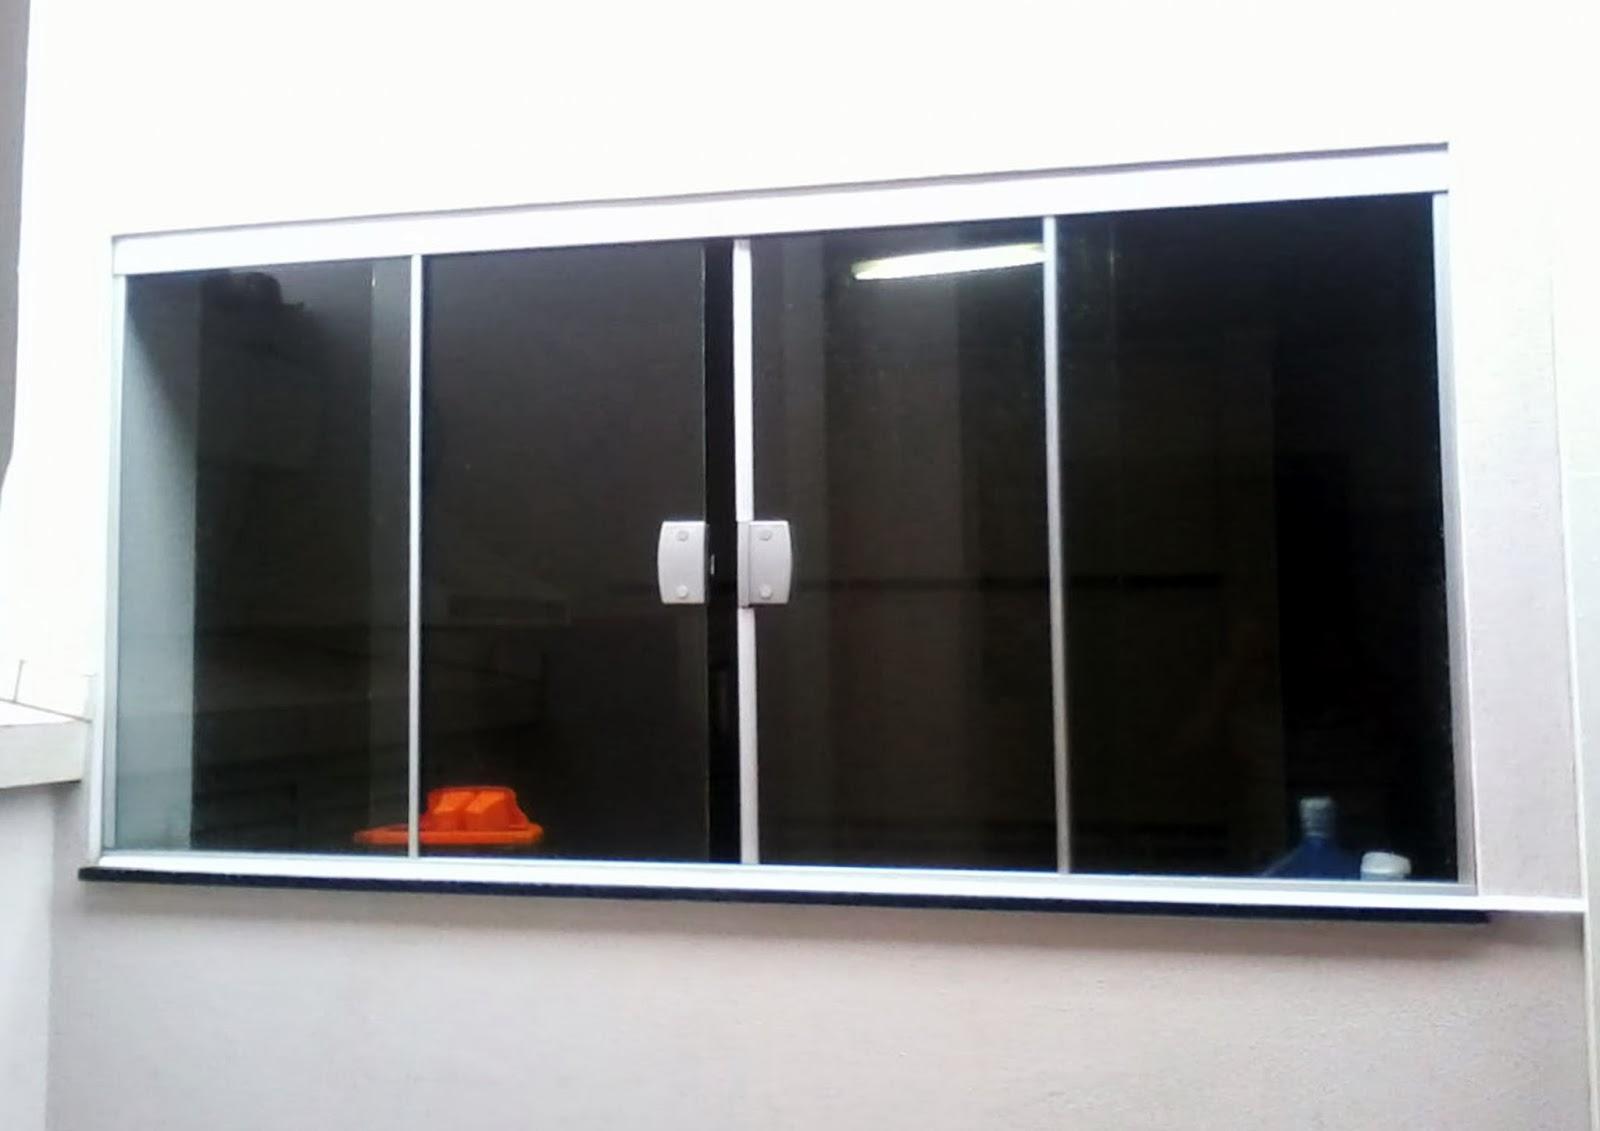 #B73914 Janela em vidro incolor temperado de 8mm com fechadura kit natural  132 Janelas De Vidro Fume